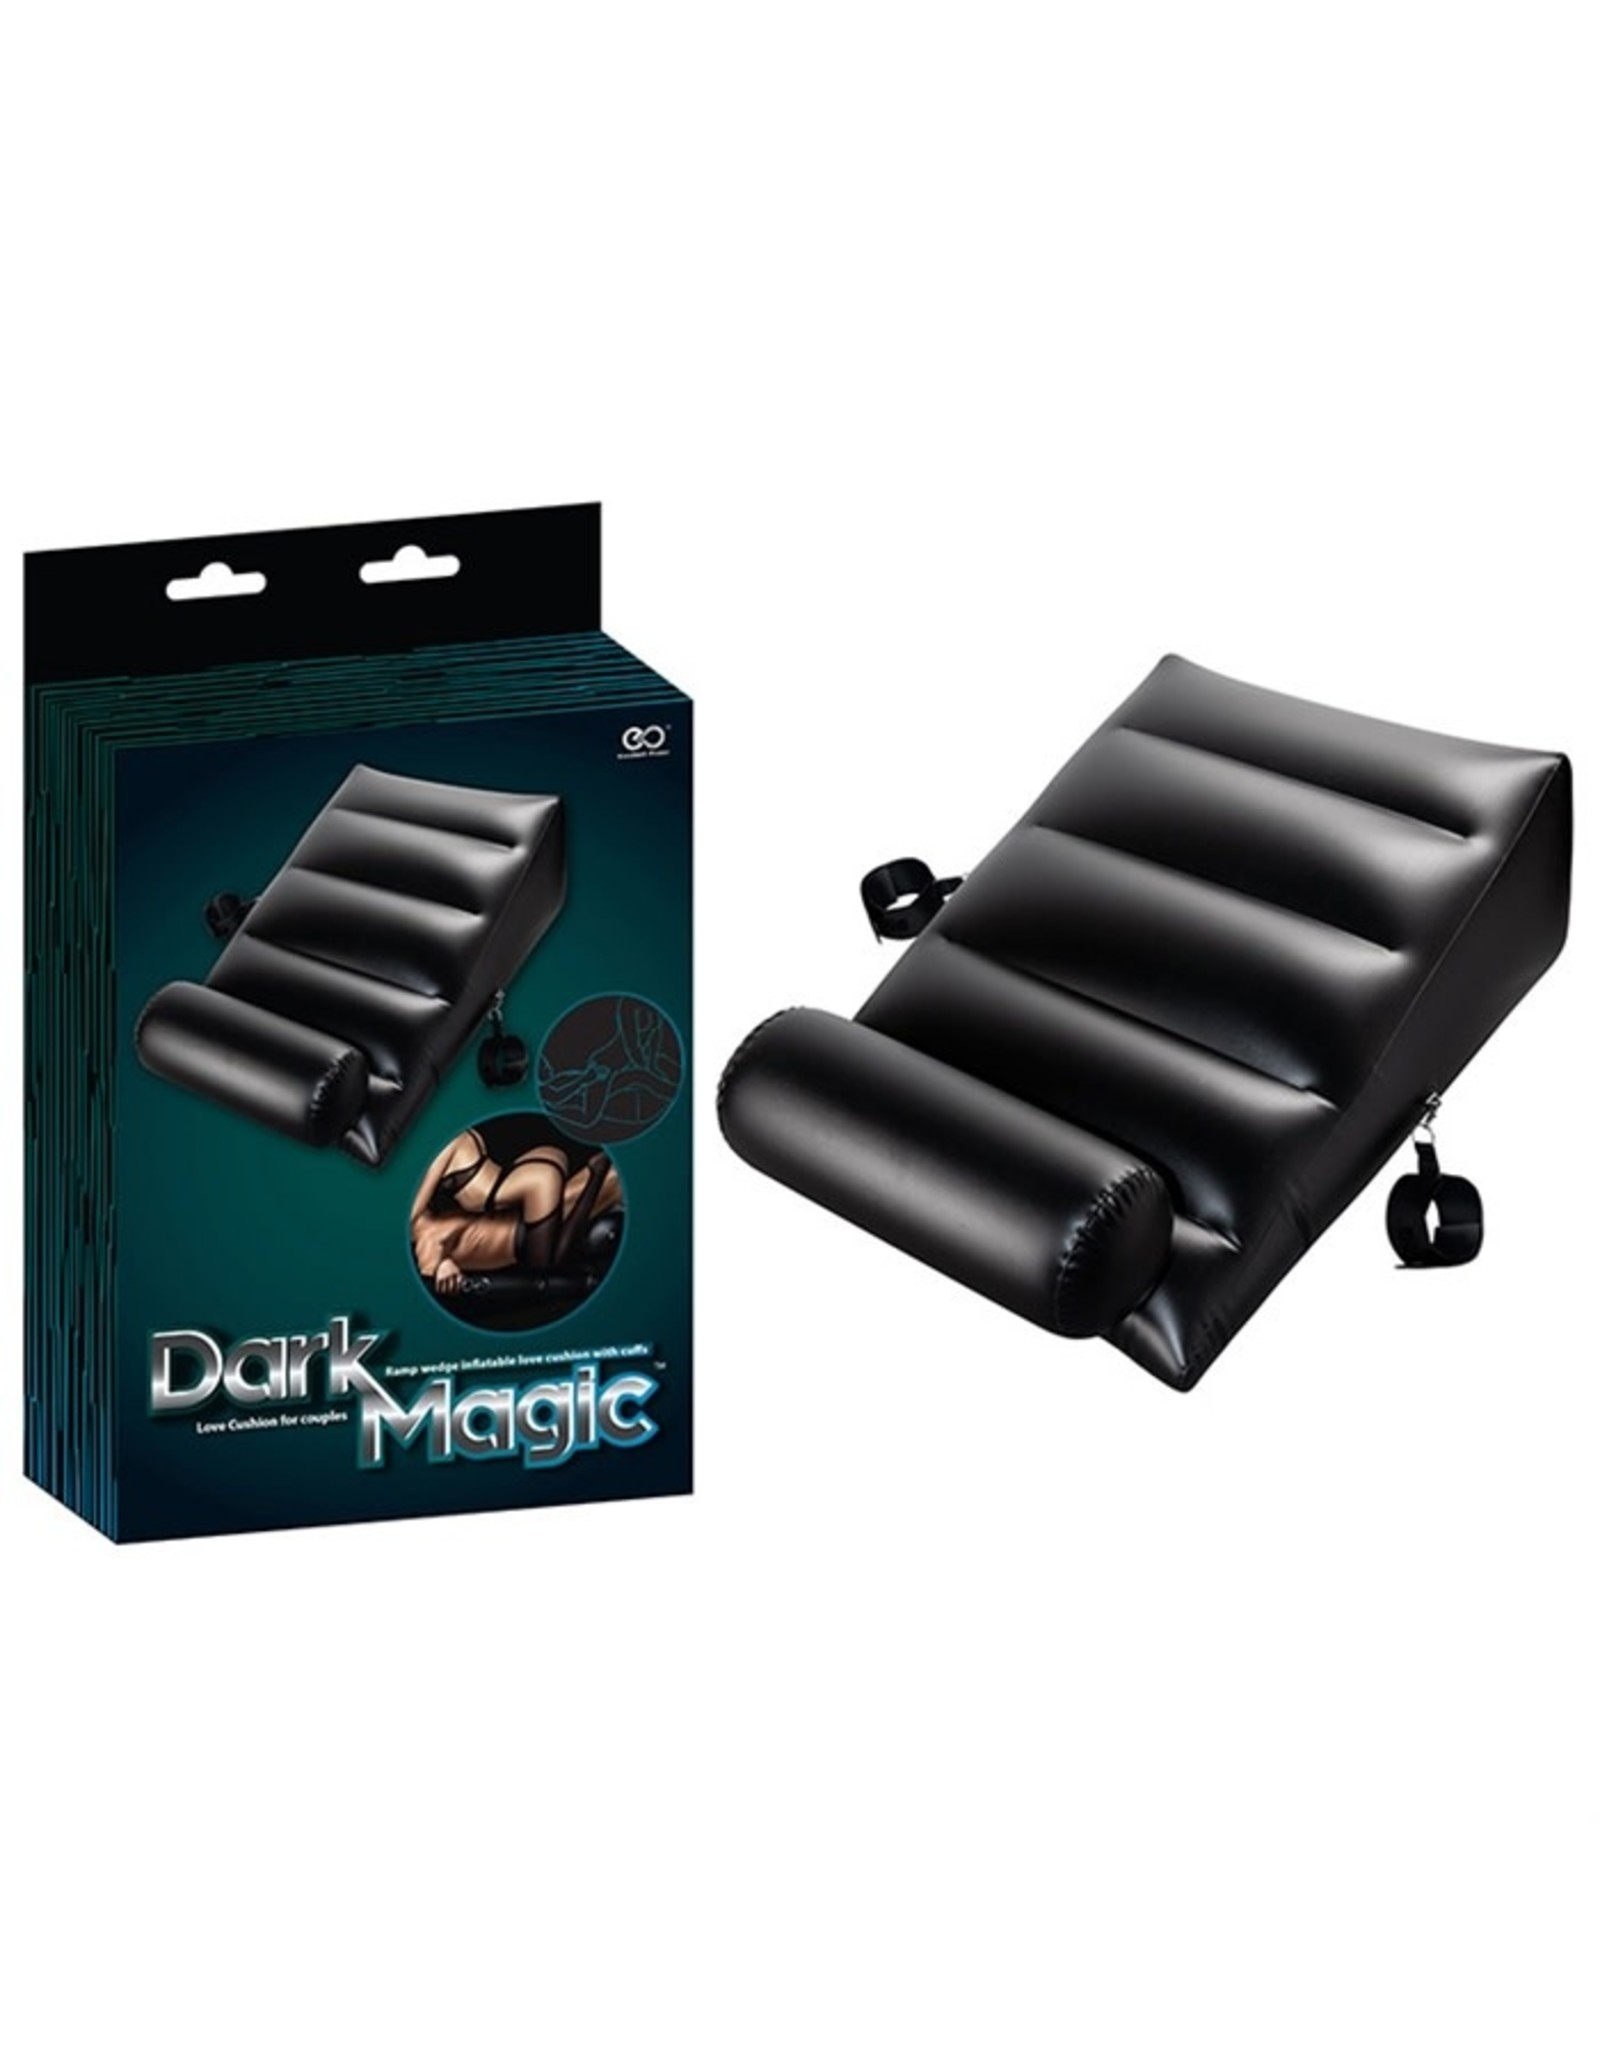 SD Variations Dark Magic - Love Cushion For Couples